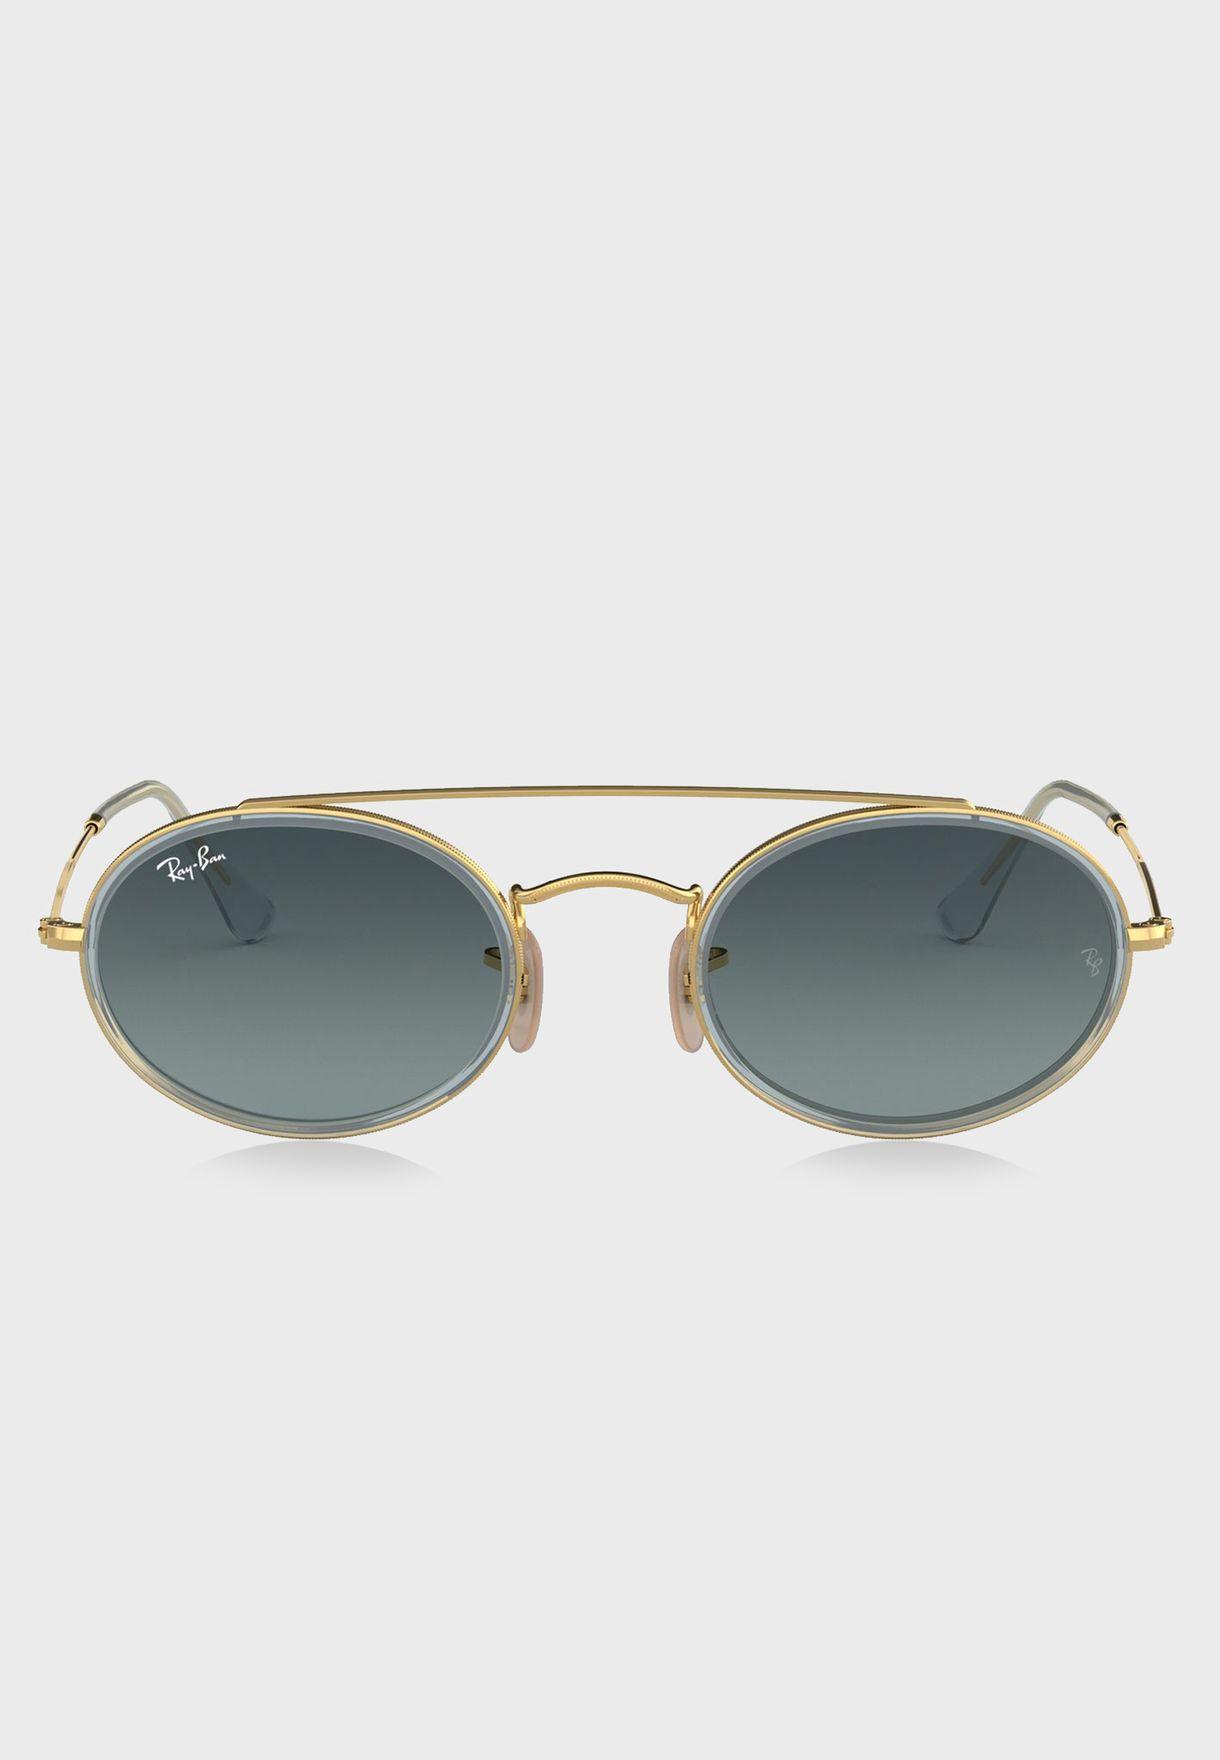 2c2fcba1dc1 Shop Ray-Ban gold 0RB3847N Double Bridge Sunglasses 8.05367E+12 for ...